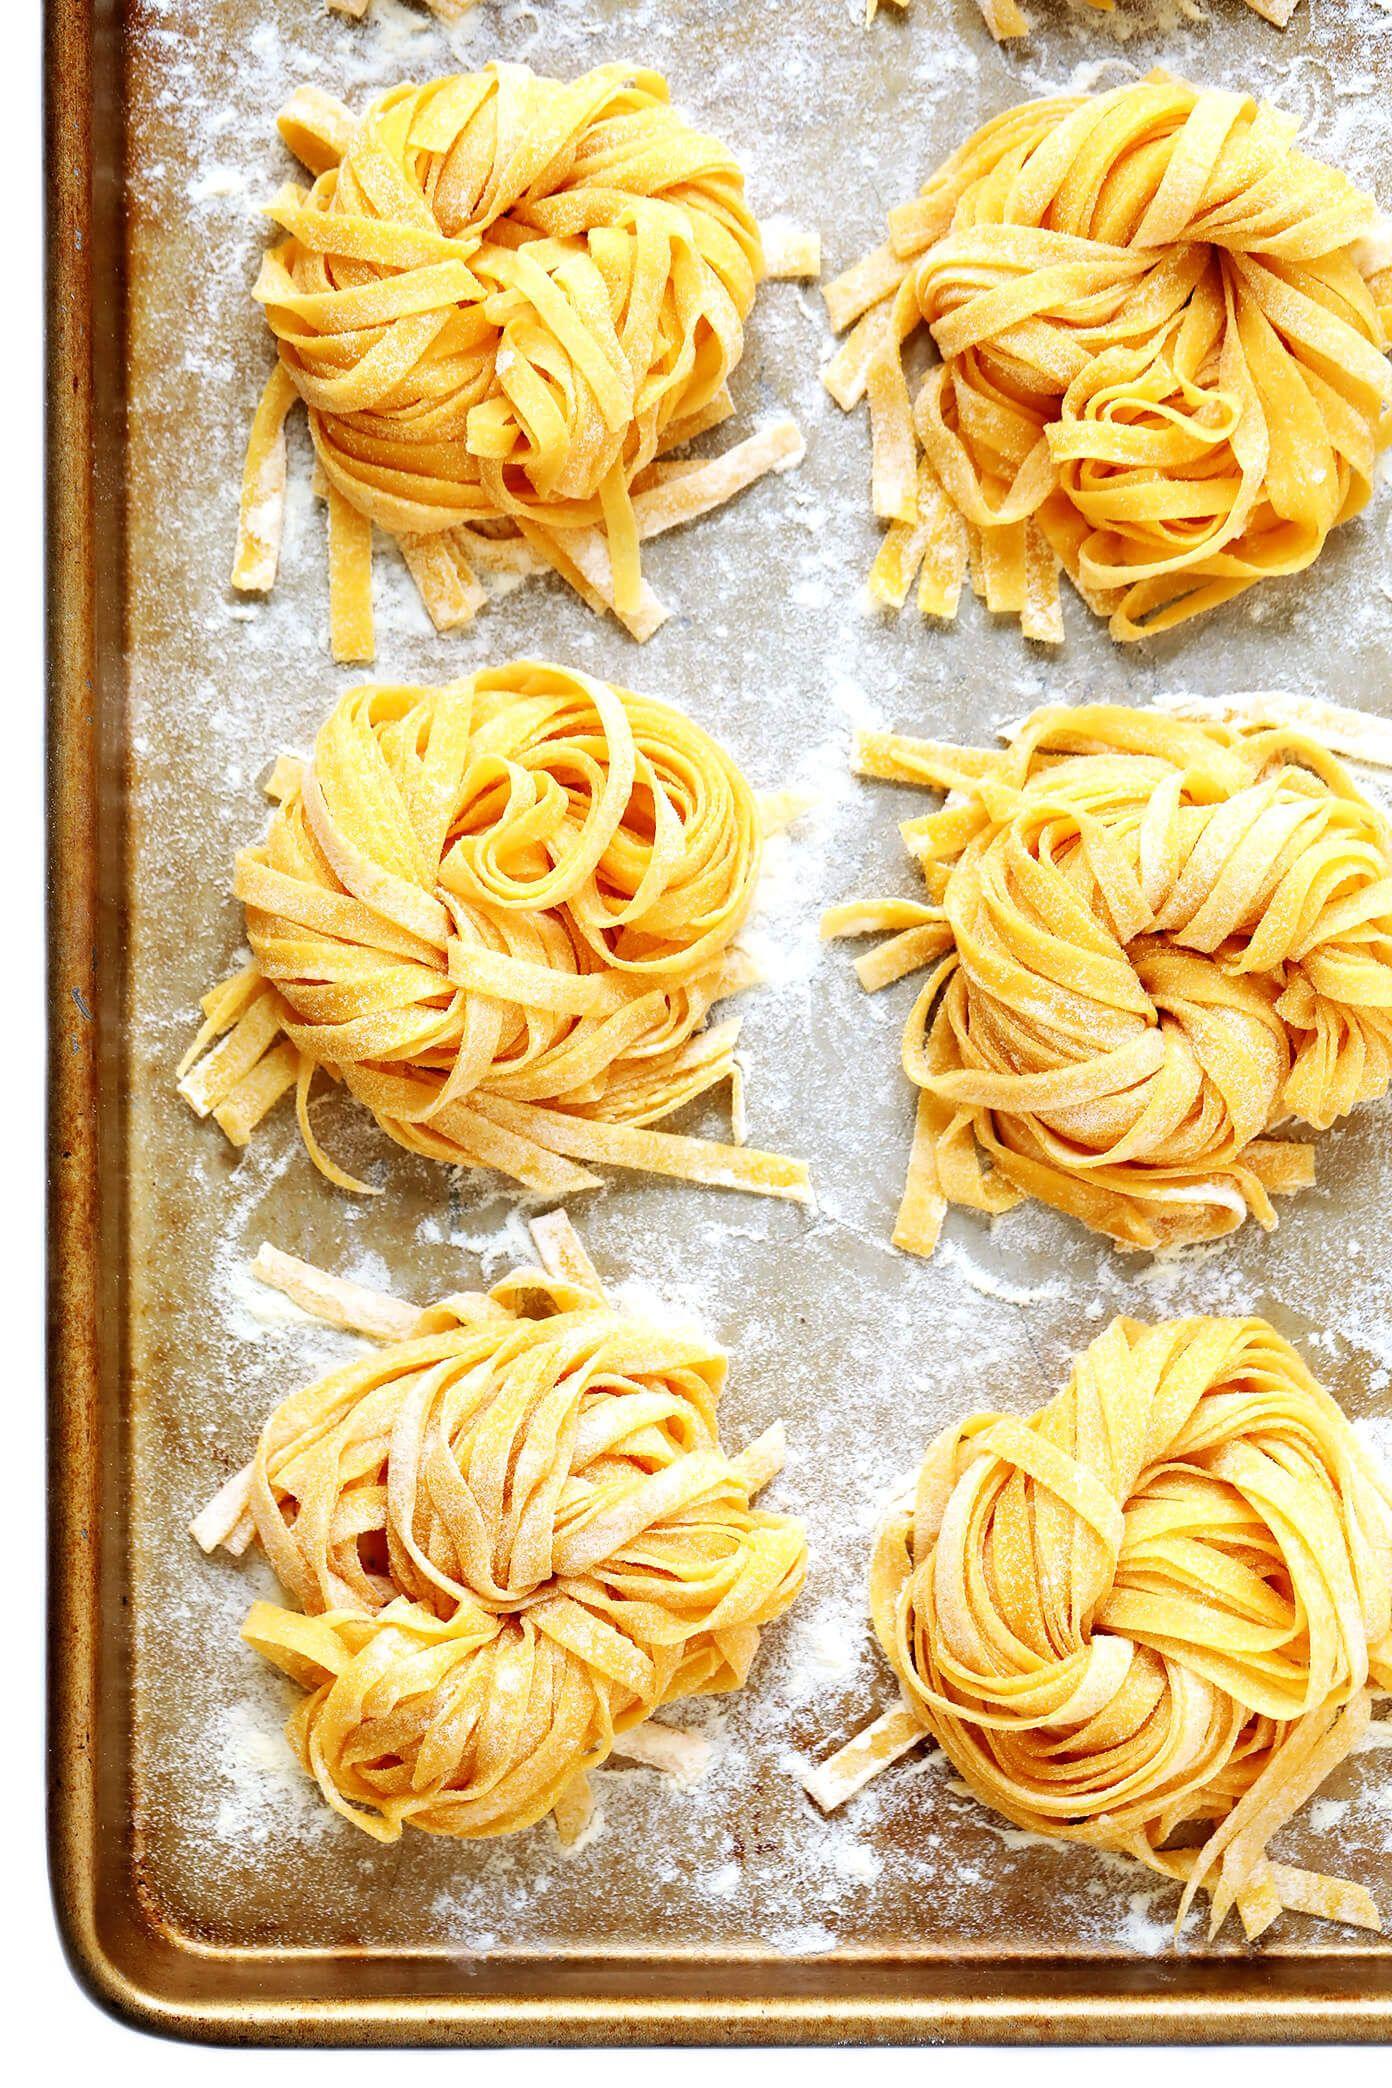 Homemade Pasta Gimme Some Oven Recipe Homemade Pasta Recipe Homemade Pasta Food Processor Recipes